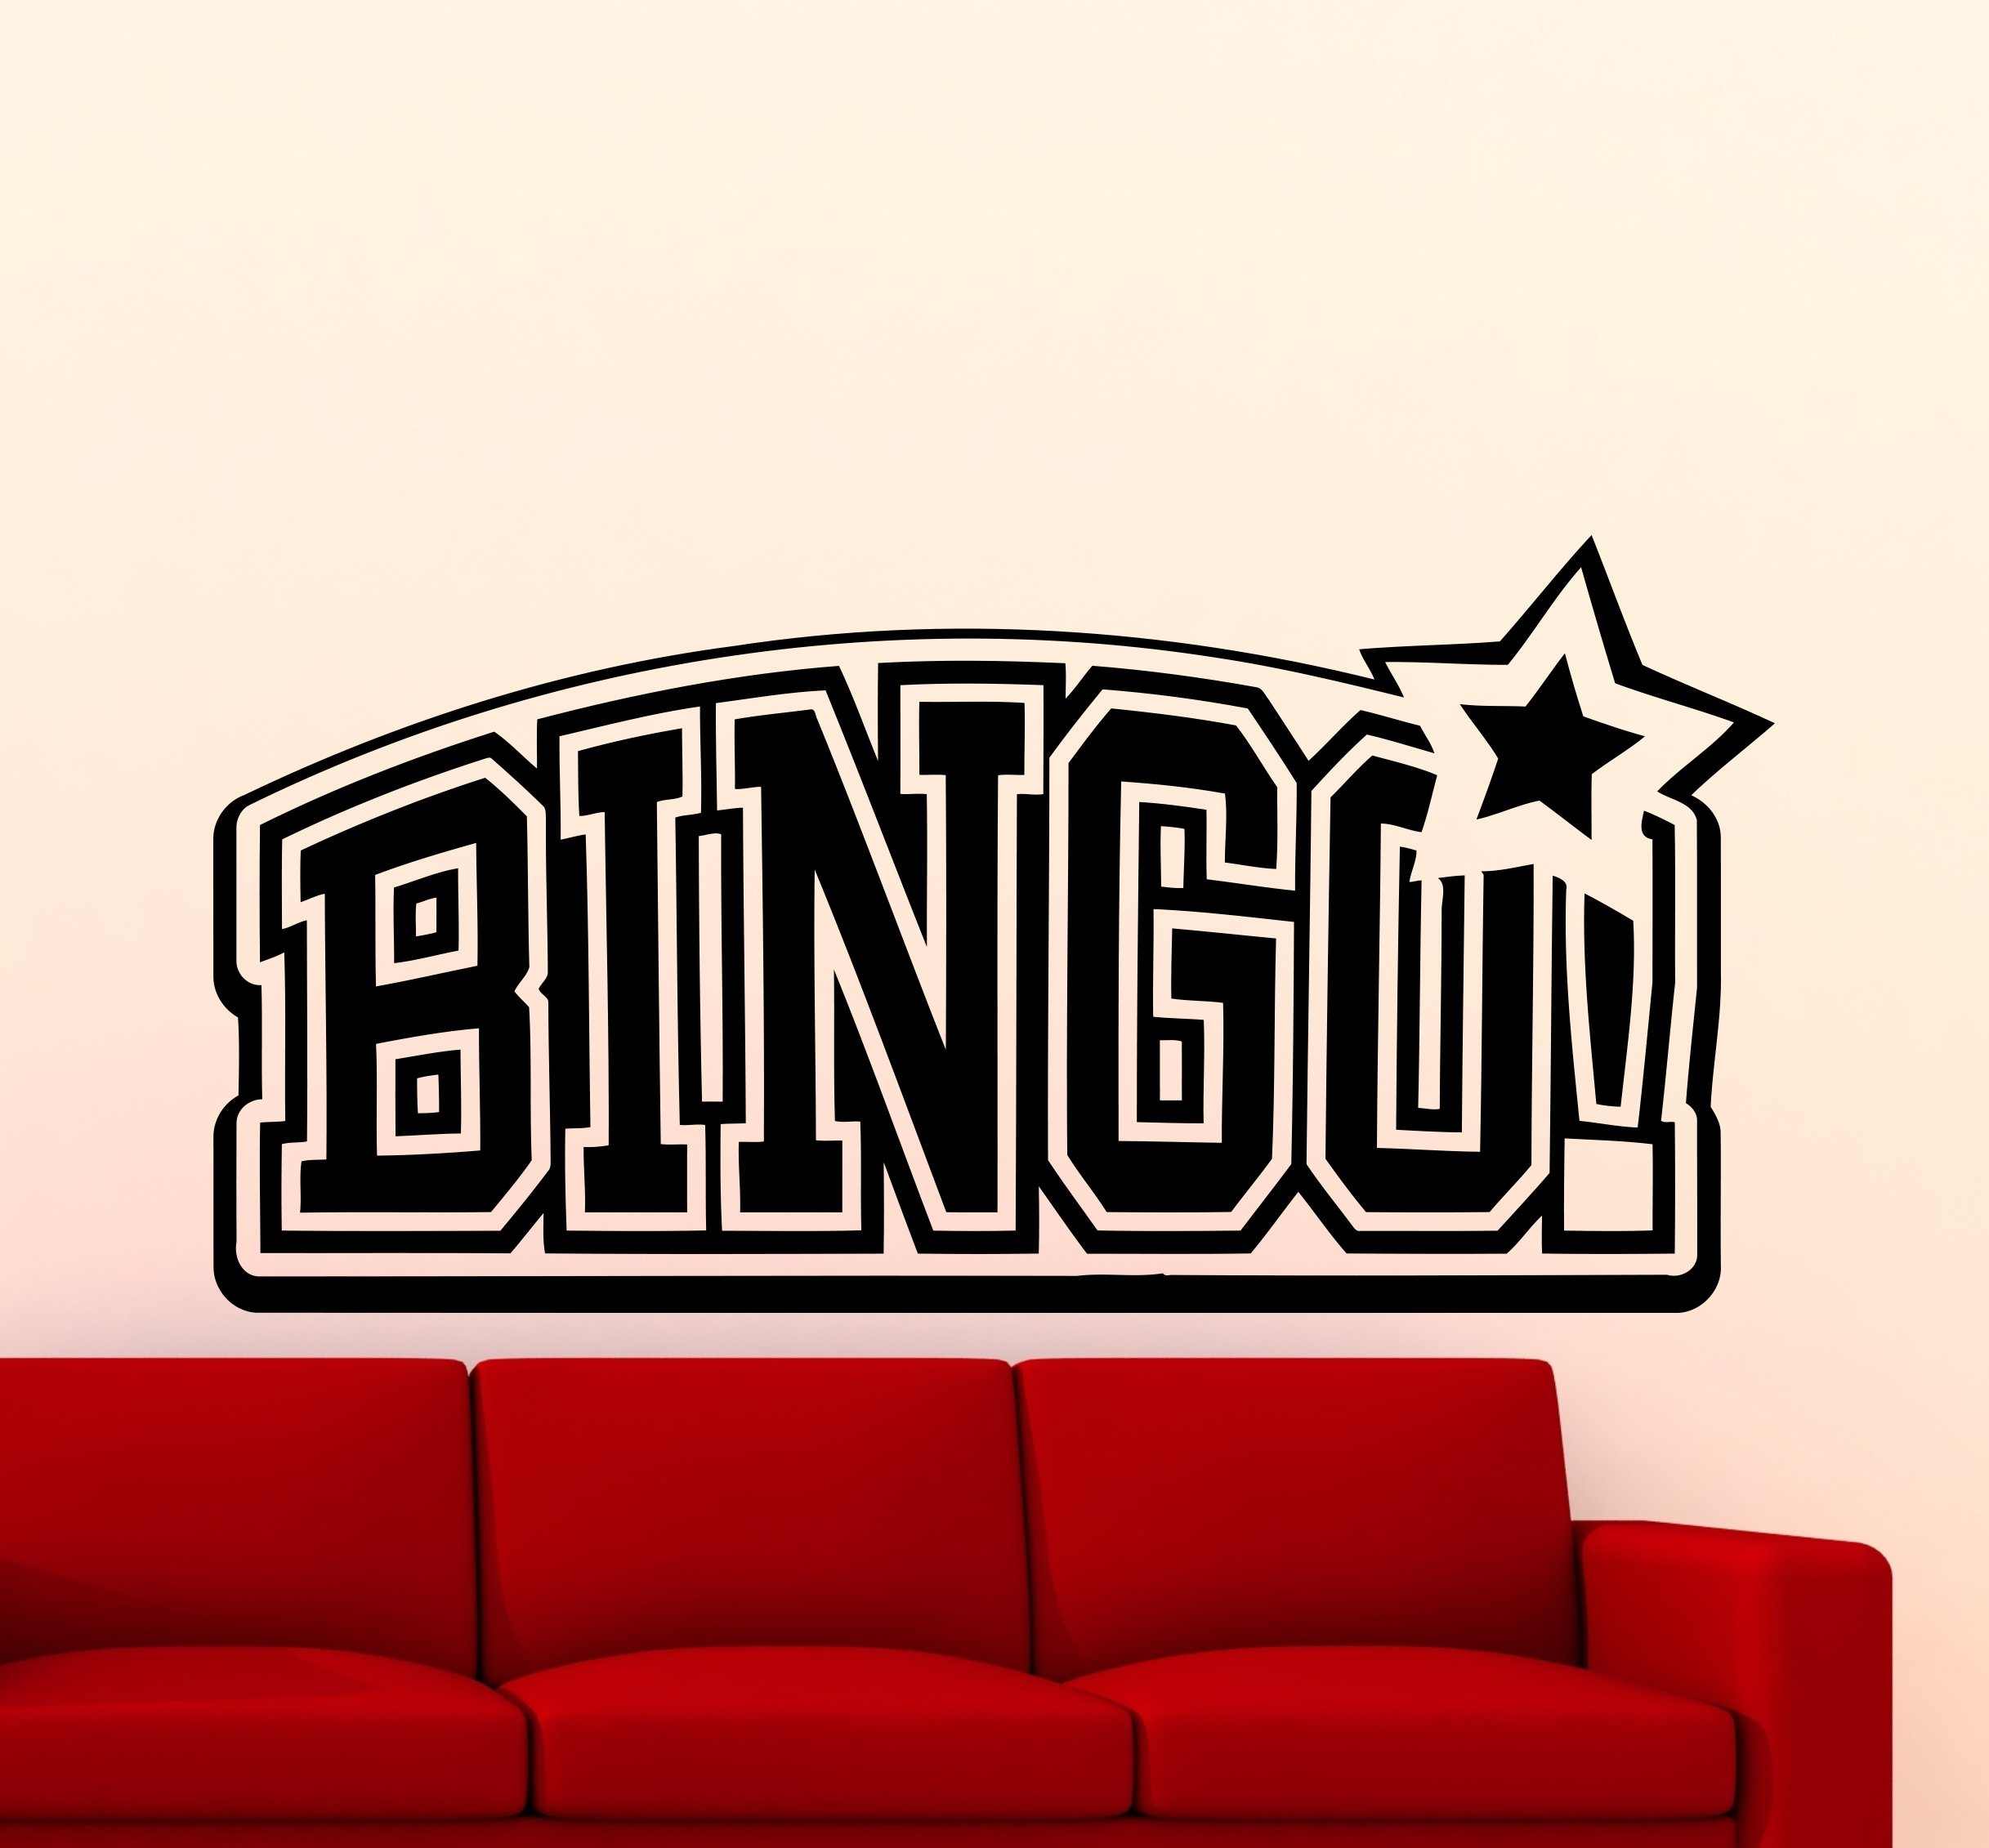 Bingo Logo Wall Decal Bingo! Emblem Casino Lottery Office Vinyl Sticker Home Room Interior Art Decoration Any Room Mural Waterproof Vinyl Sticker (245xx) by Awesome Decals